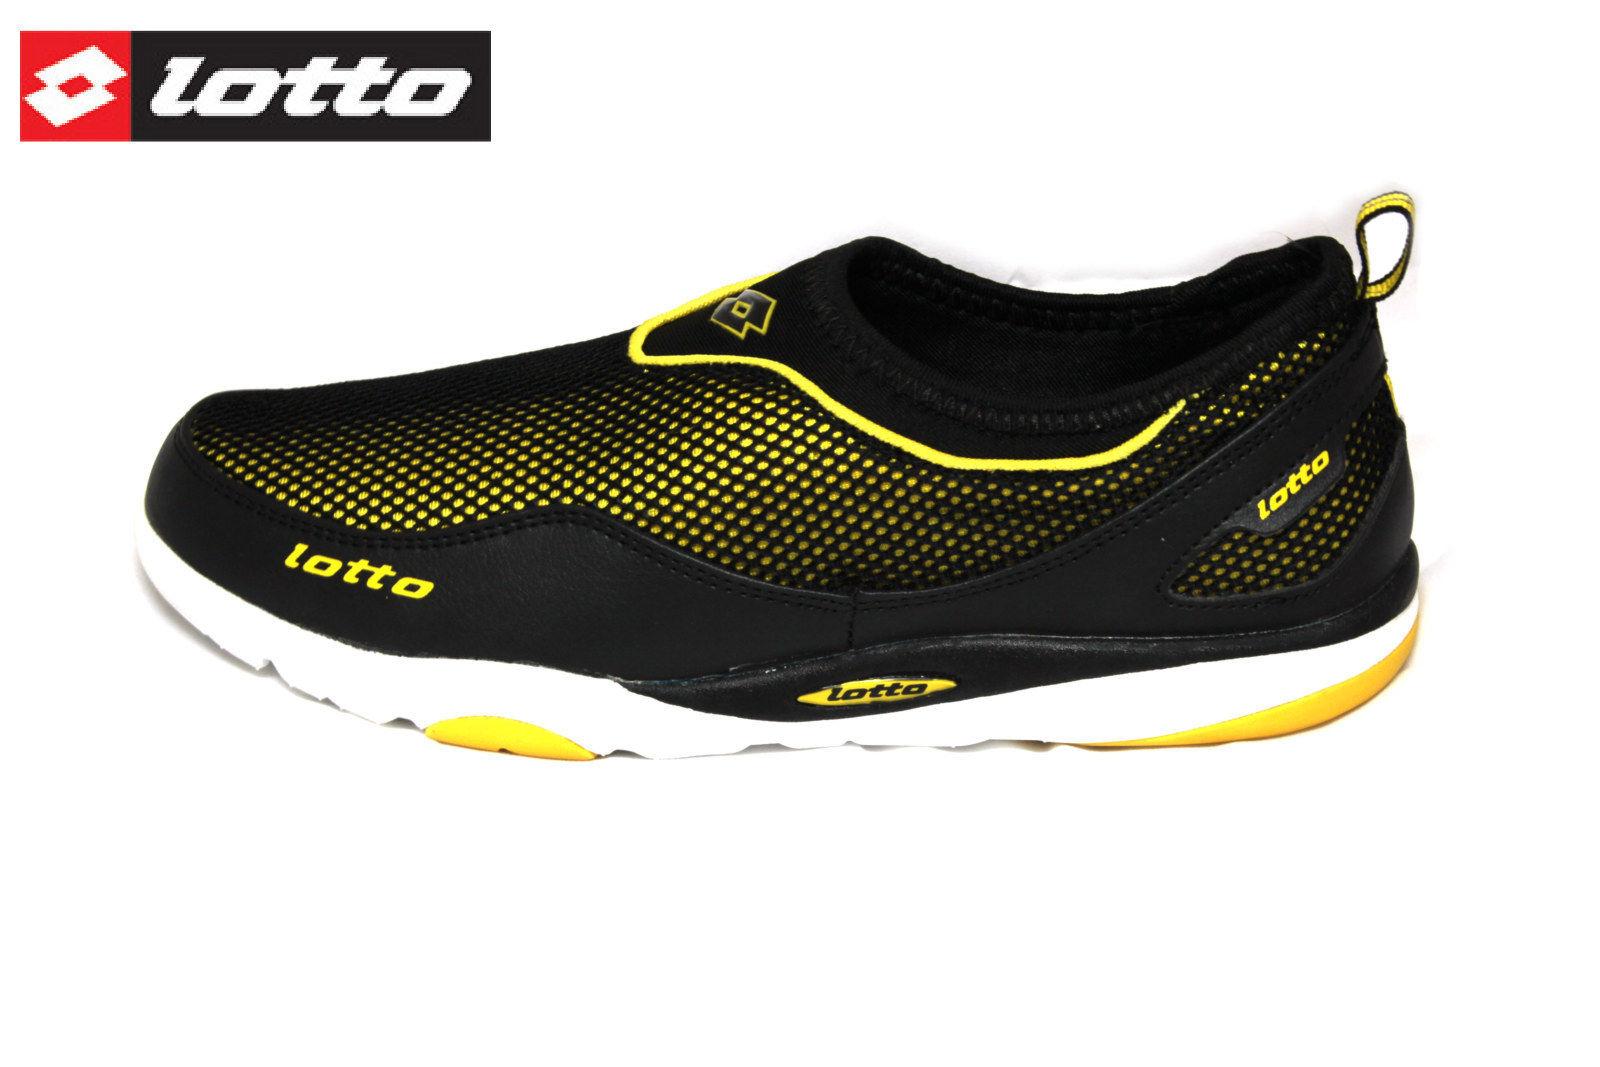 Adidas-Mesh-Slip-On-Running-Shoes-Olympic-Rings.jpg